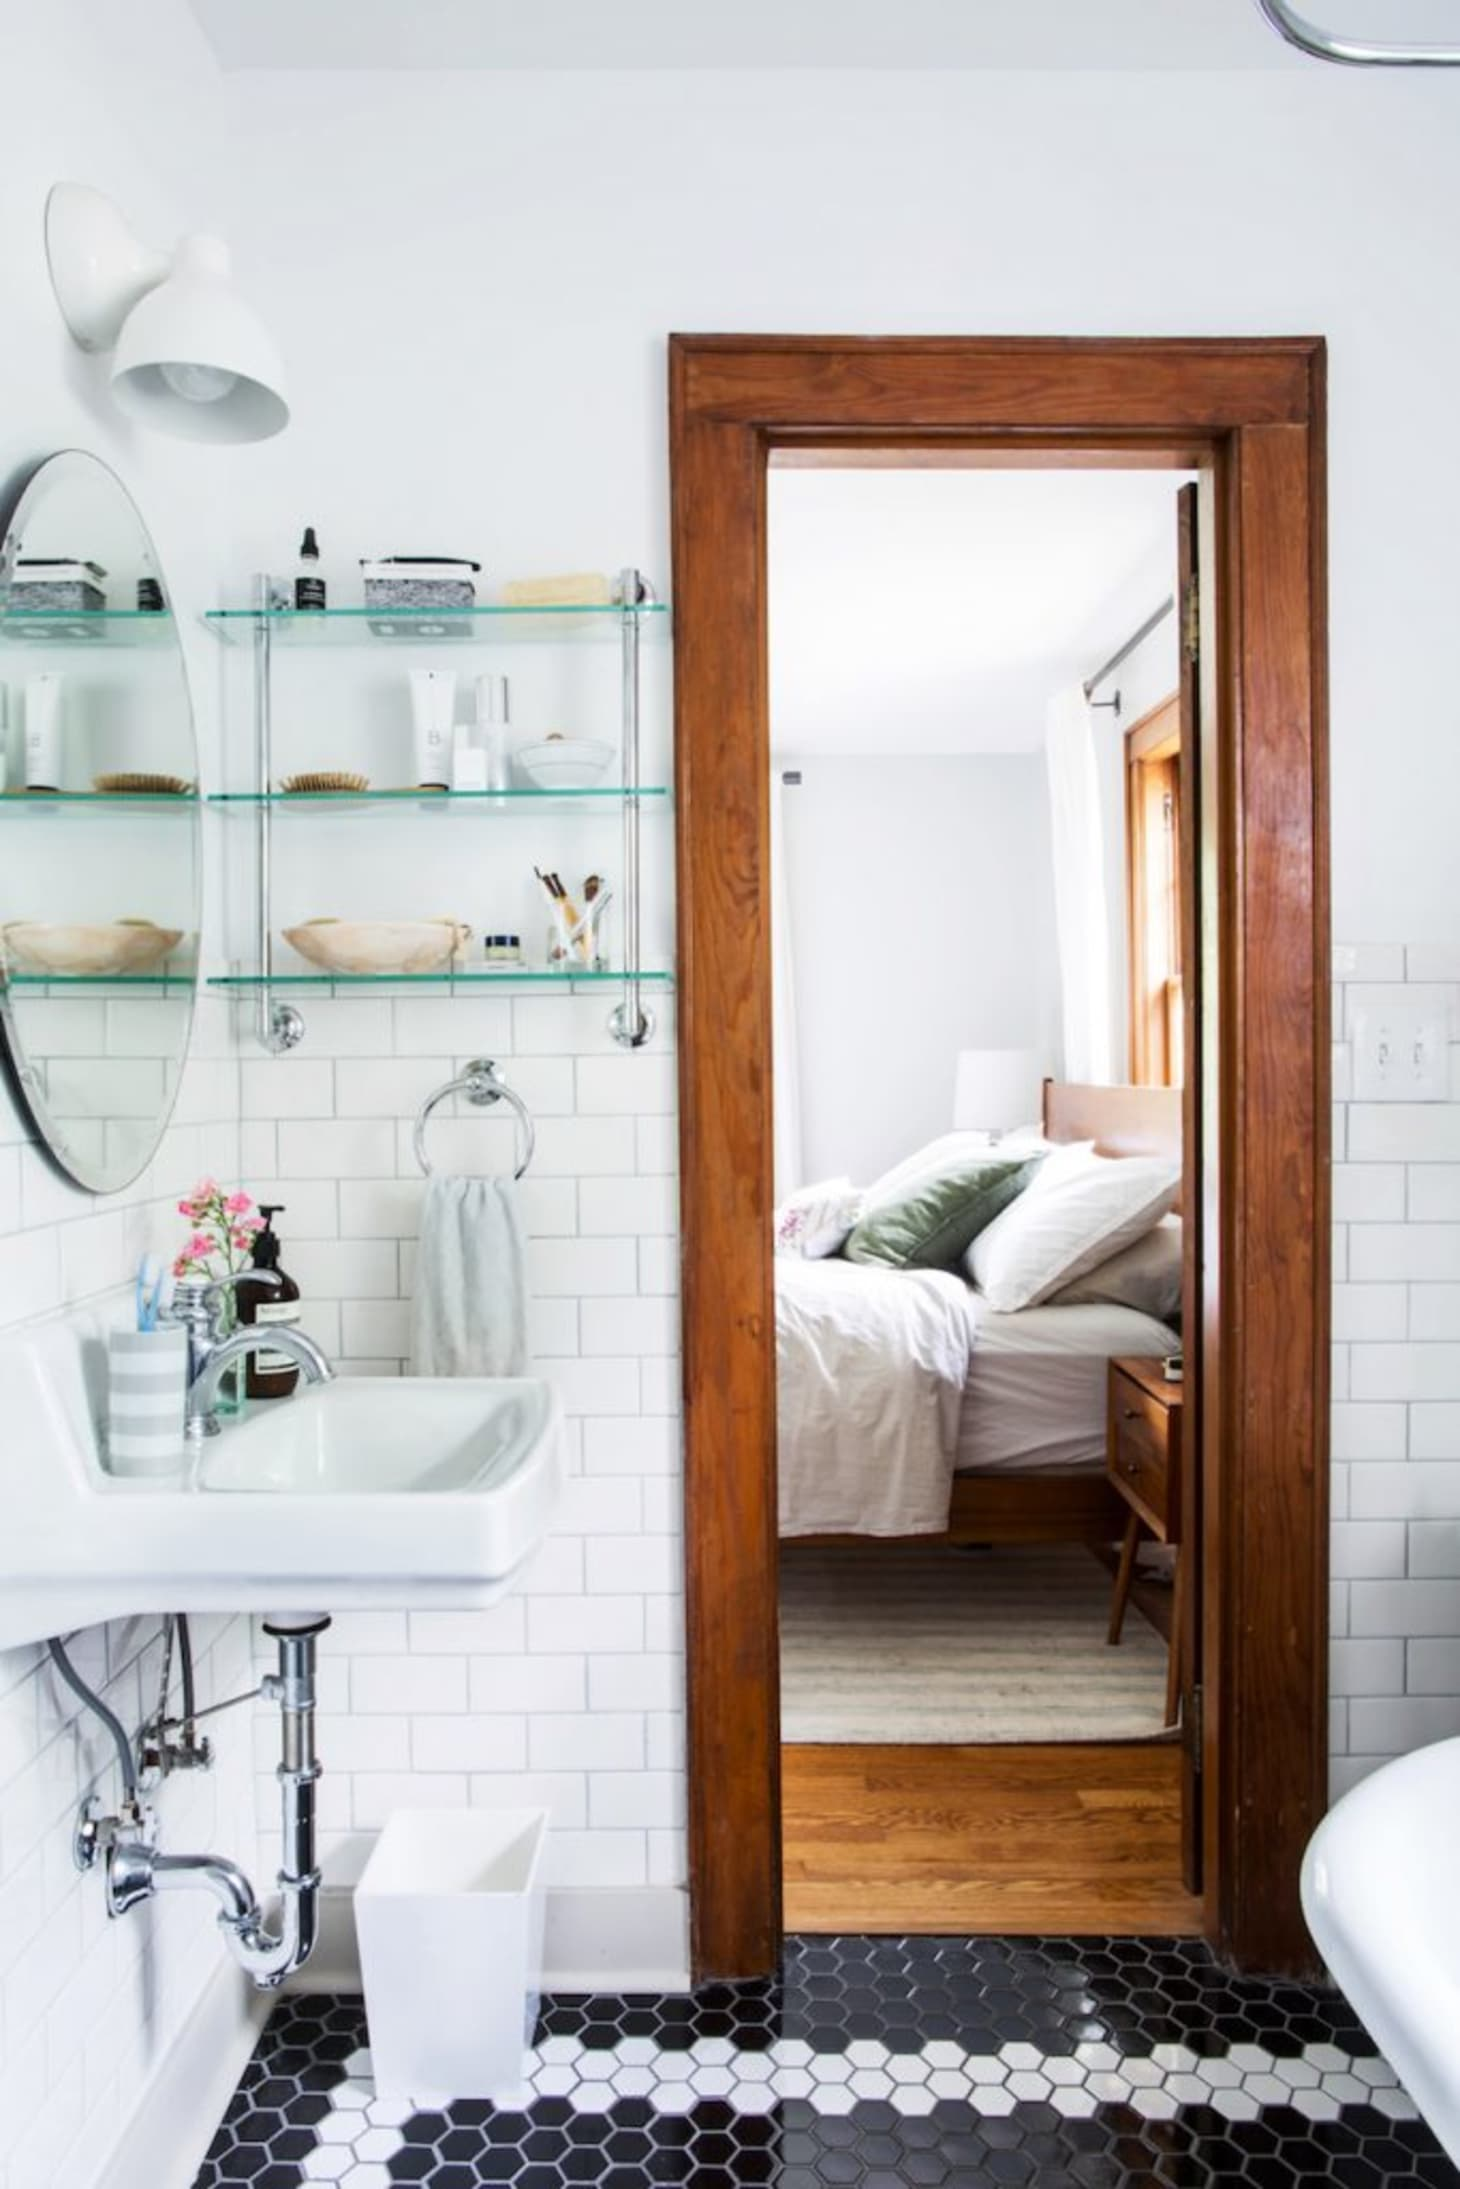 Small Bathroom Best Wall Shelves Storage Ideas | Apartment ... on Small Apartment Bathroom Storage Ideas  id=64731